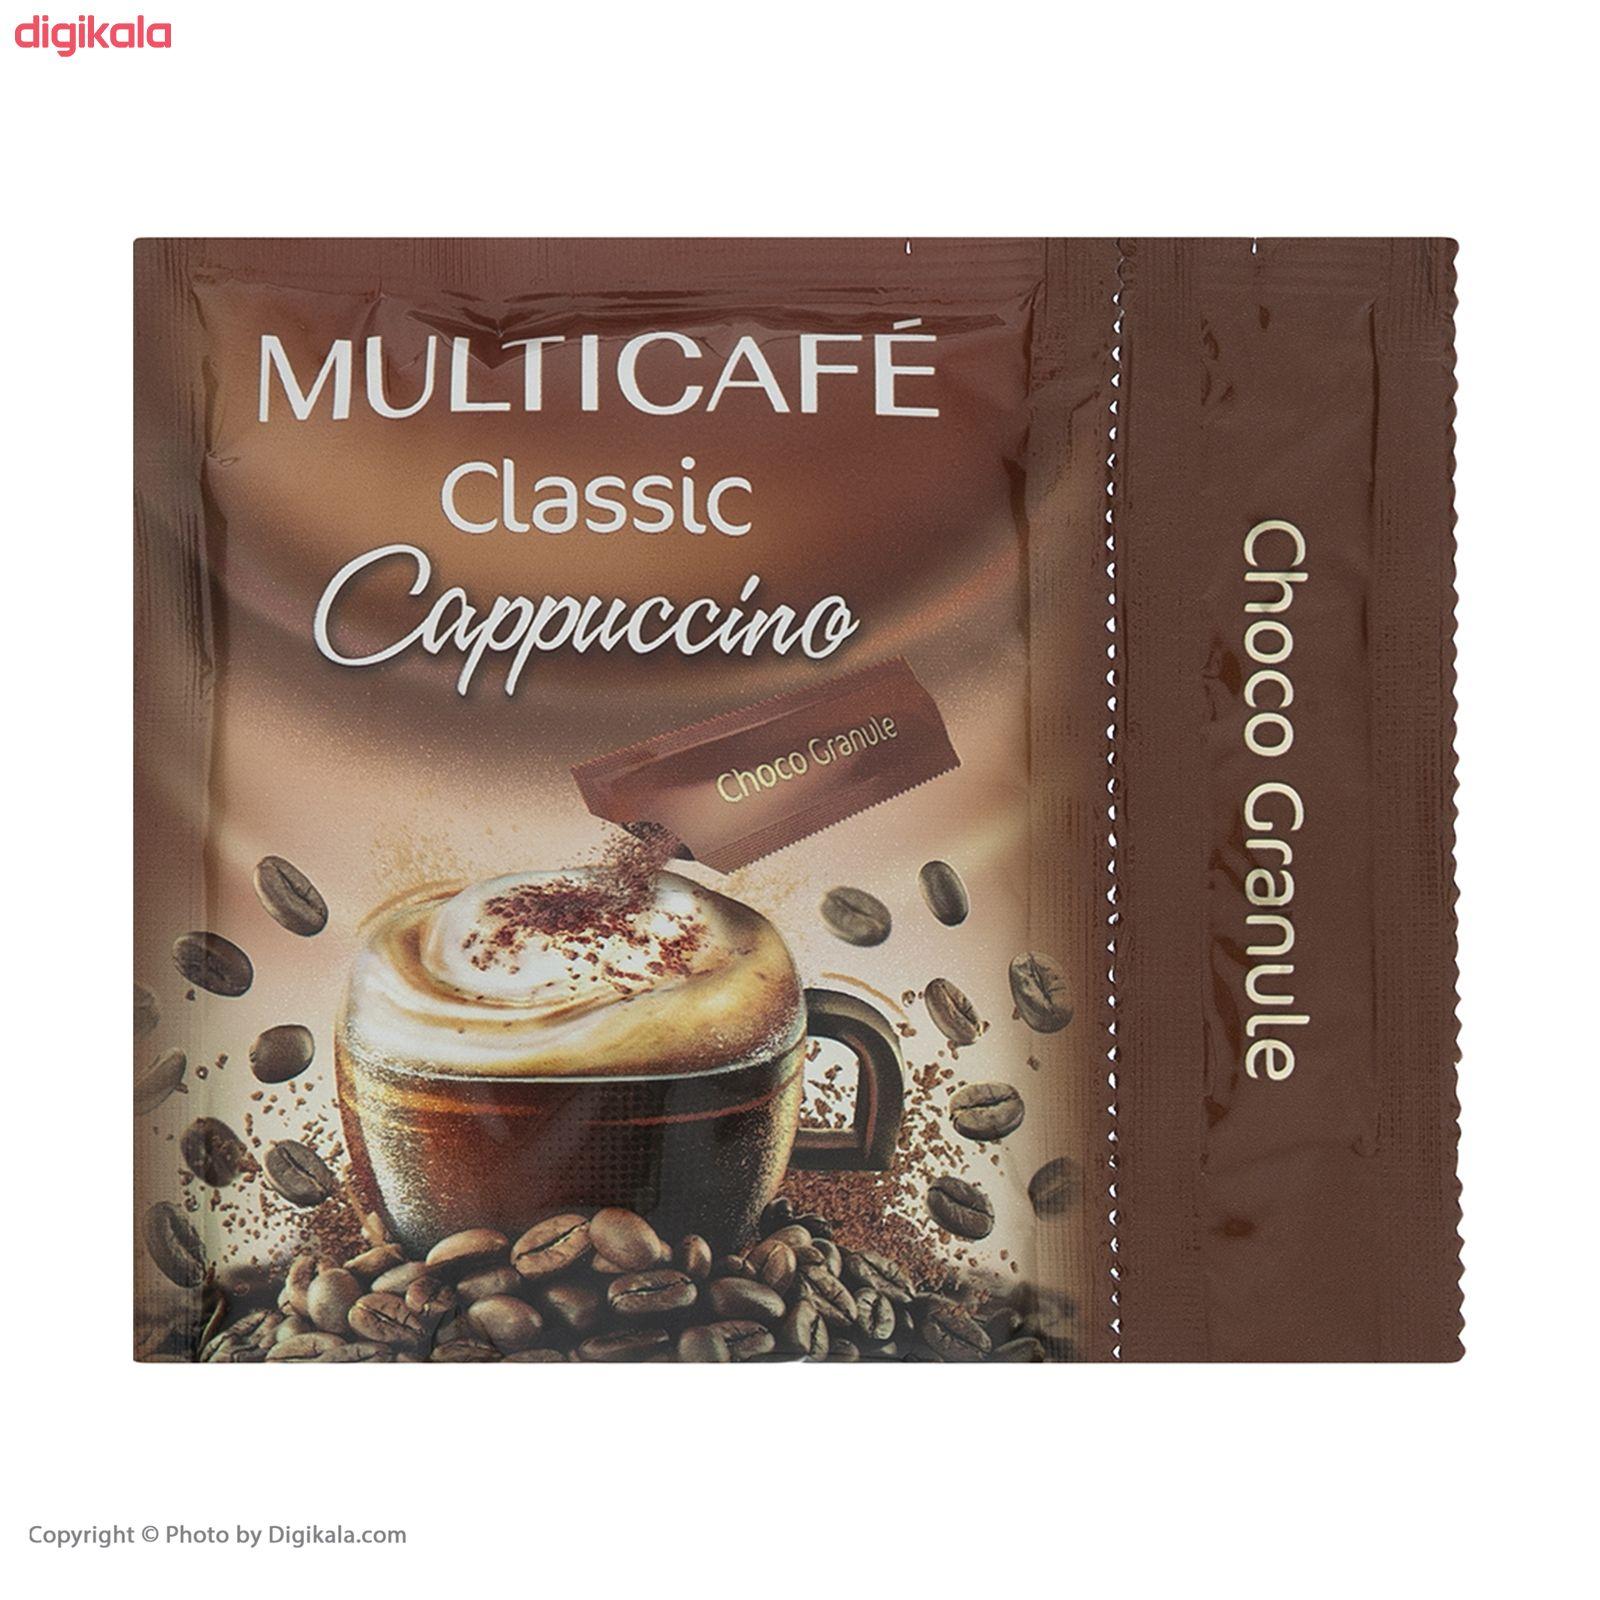 پودر قهوه فوری مخلوط کلاسیک مولتی کافه  - 18 گرم بسته 24 عددی main 1 2